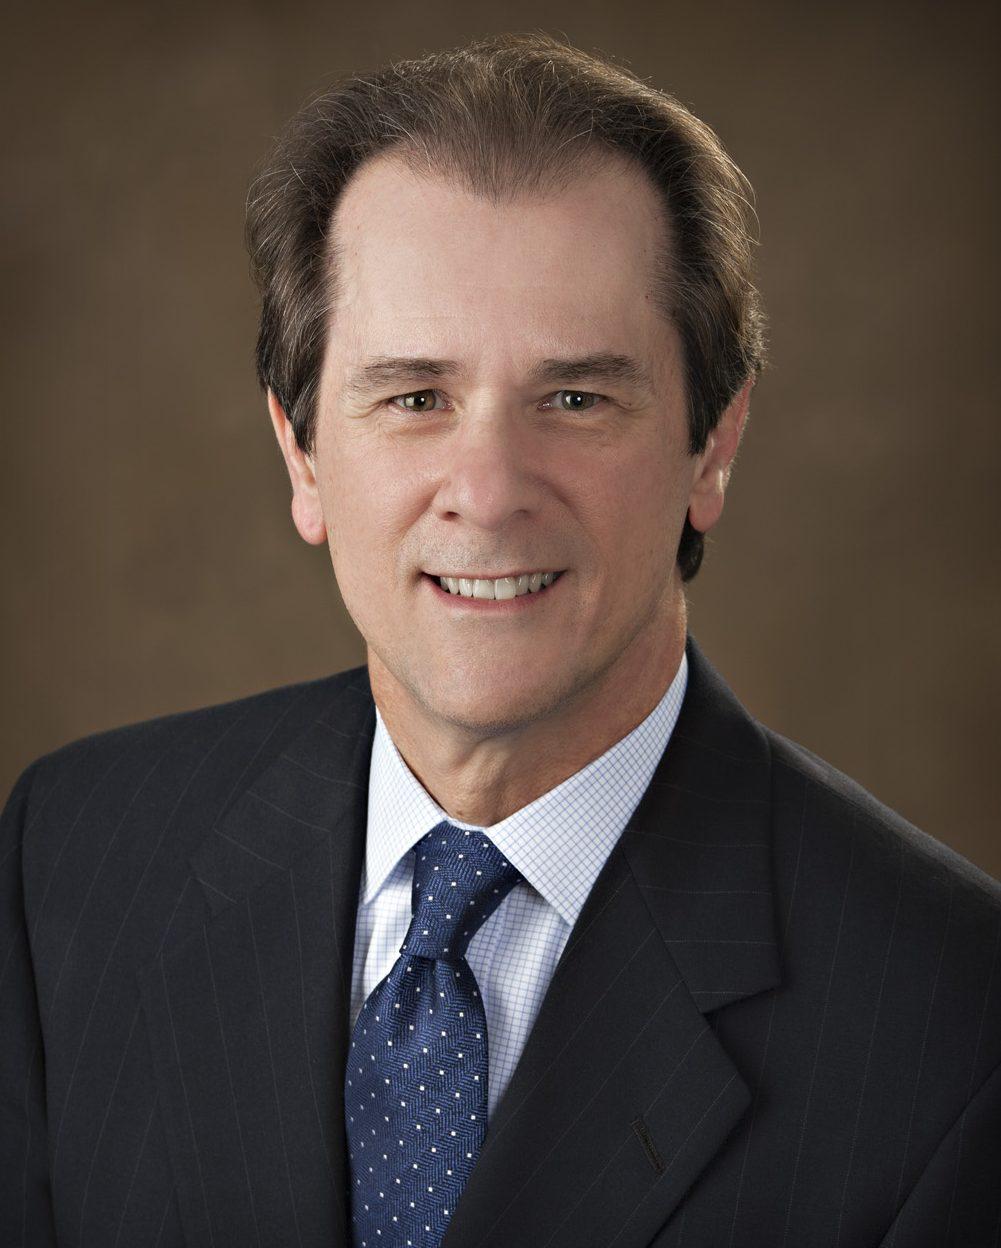 Ken Stephon